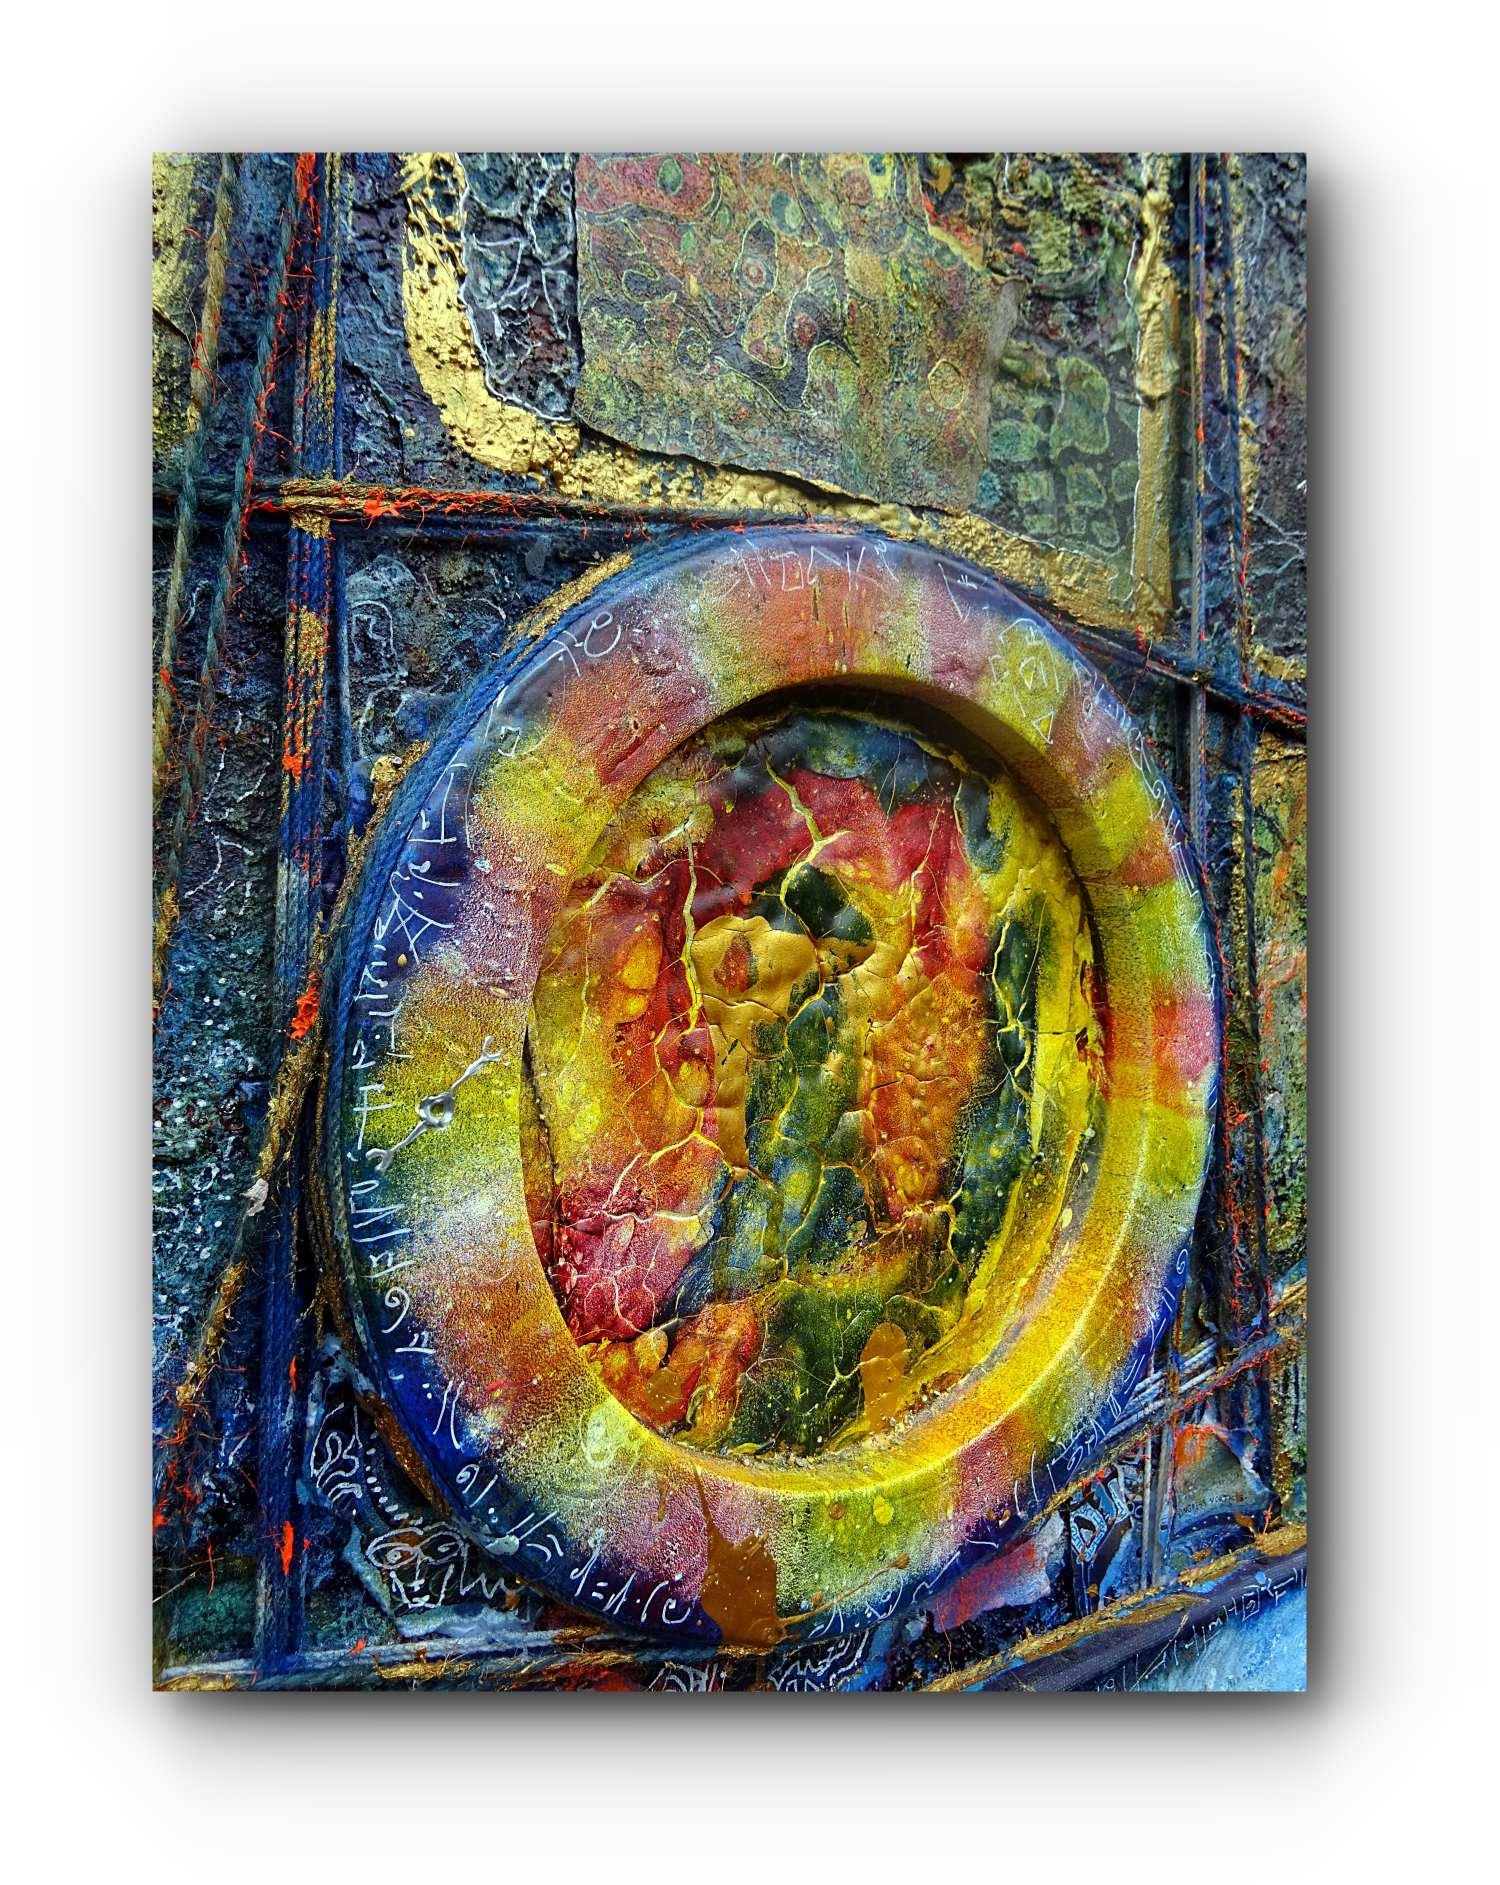 painting-detail-1-portal-artist-duo-ingress-vortices.jpg